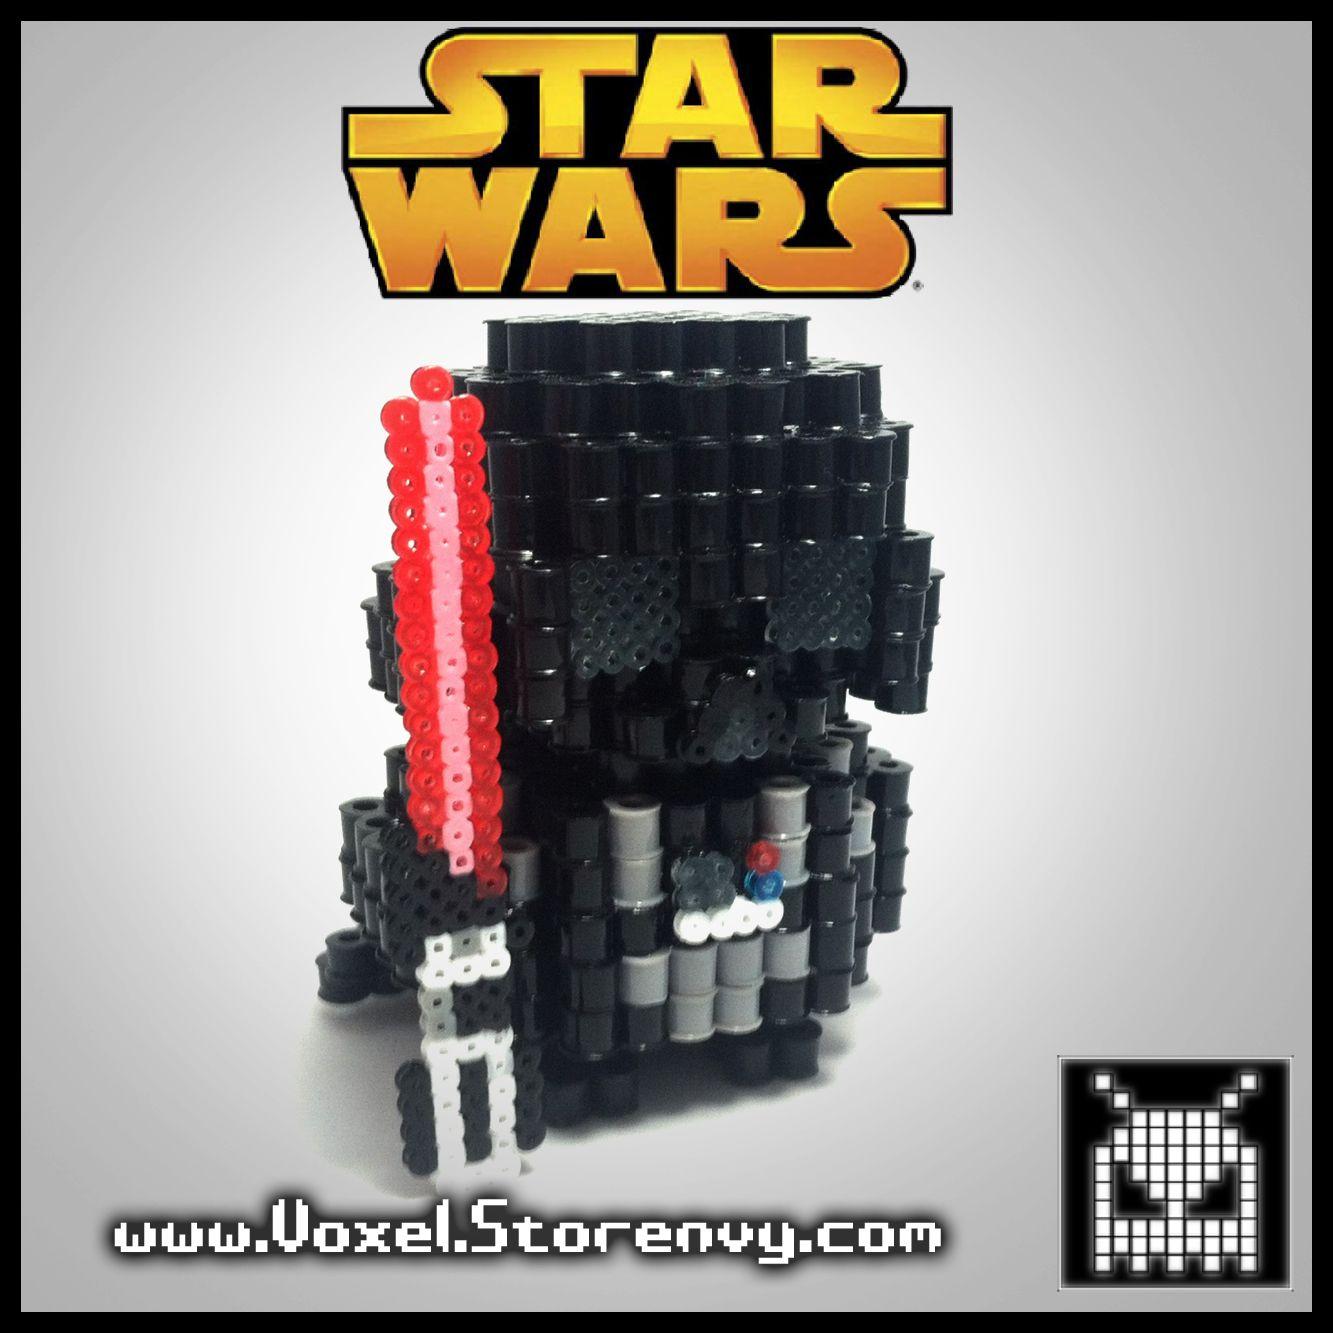 Star Wars Darth Vader Hama Perler Beads By Kaynoa01 Bugelperlen